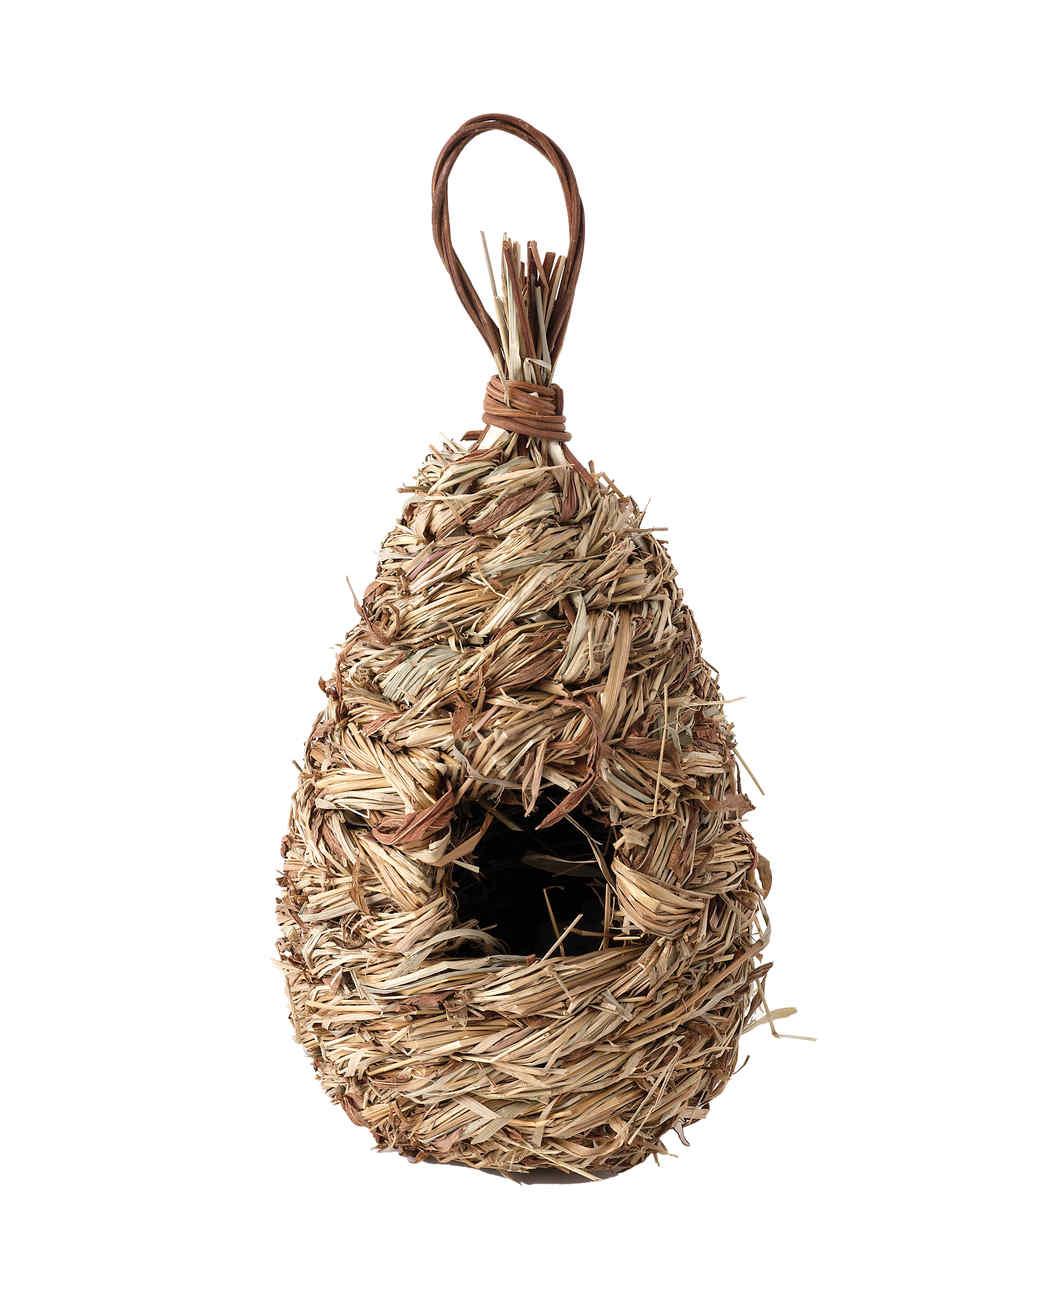 birdhouse-finds-0811mld107422.jpg